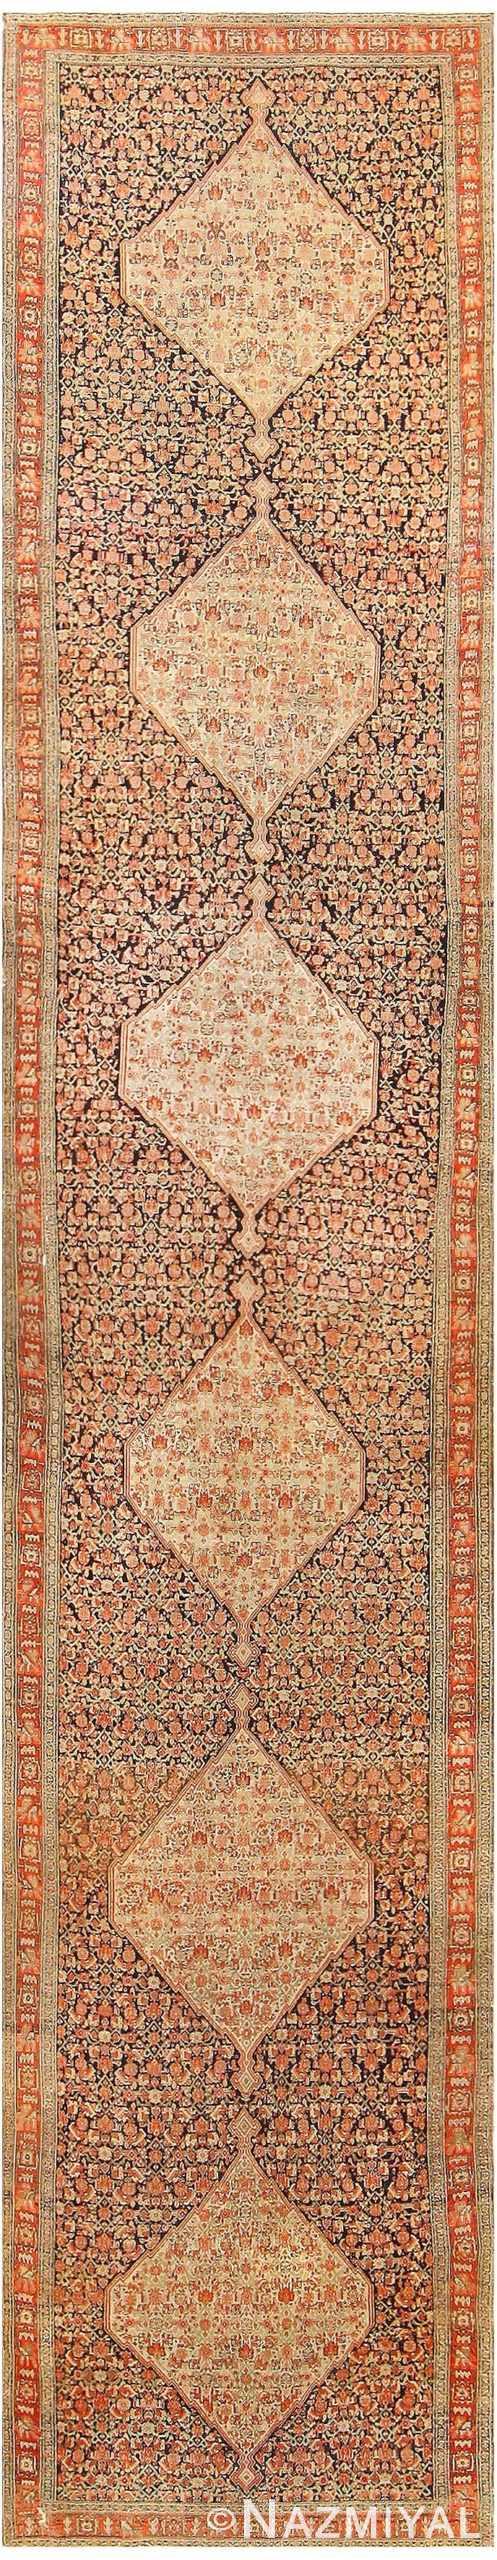 Antique Persian Senneh Runner Rug 48089 by Nazmiyal